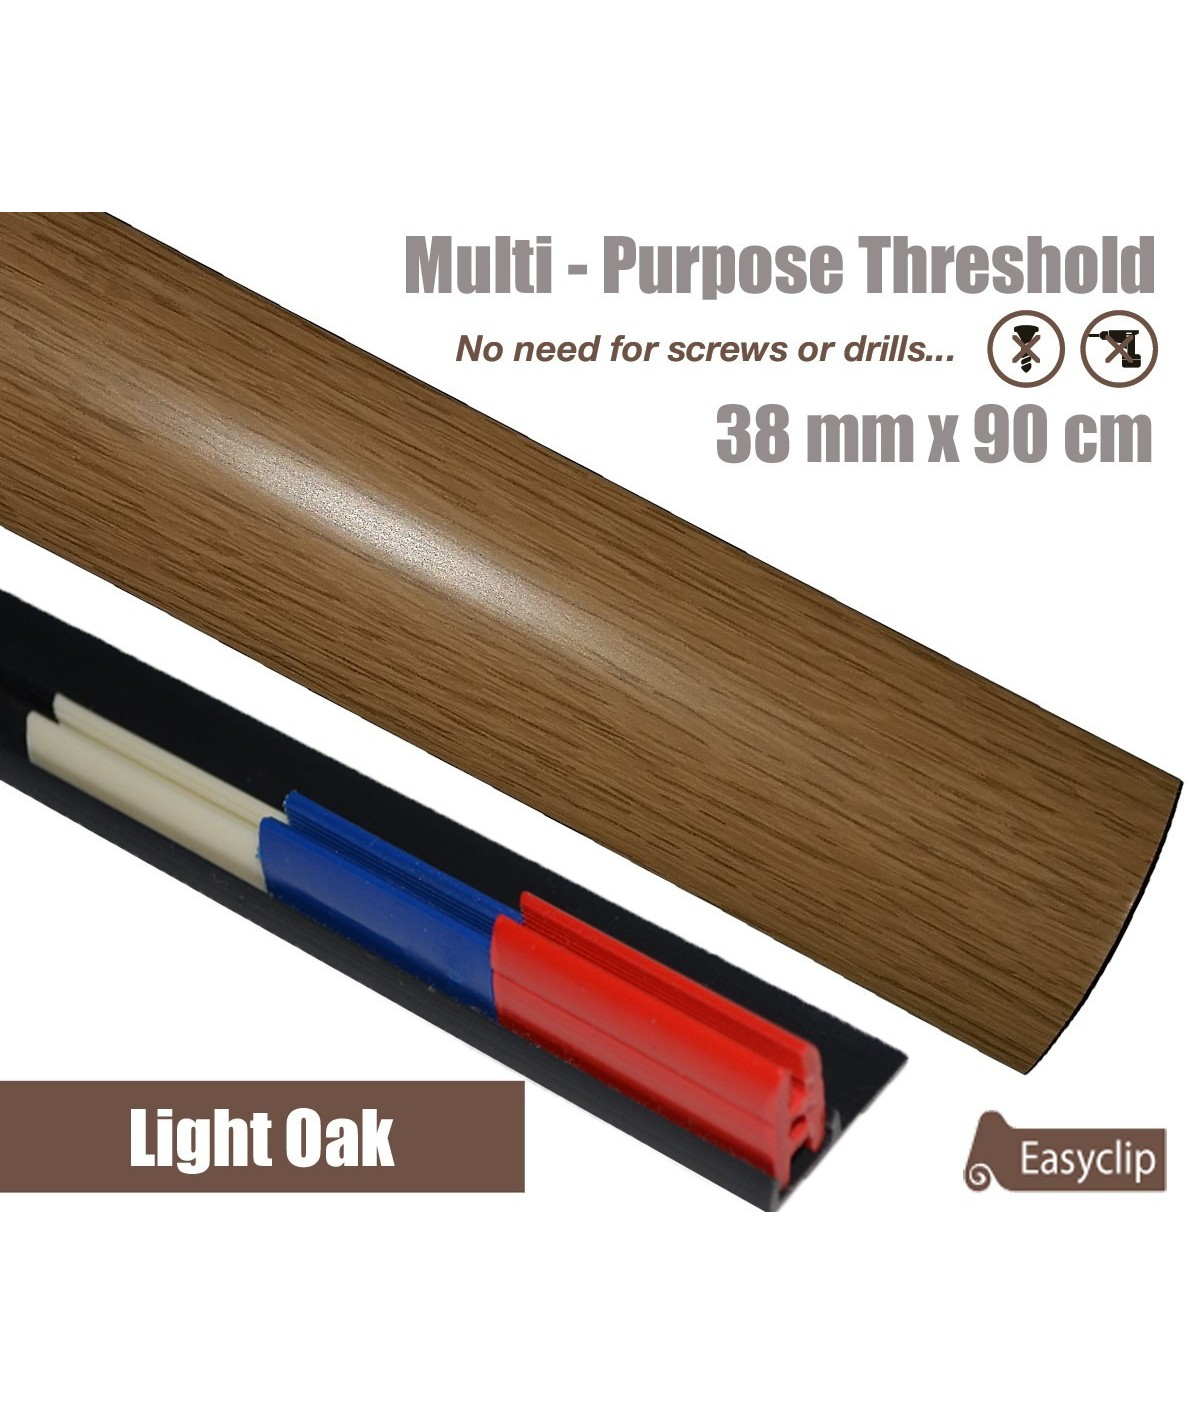 Light Oak Laminated Transition Strip Threshold 38mm Pivots 90cm Multi-Purpose